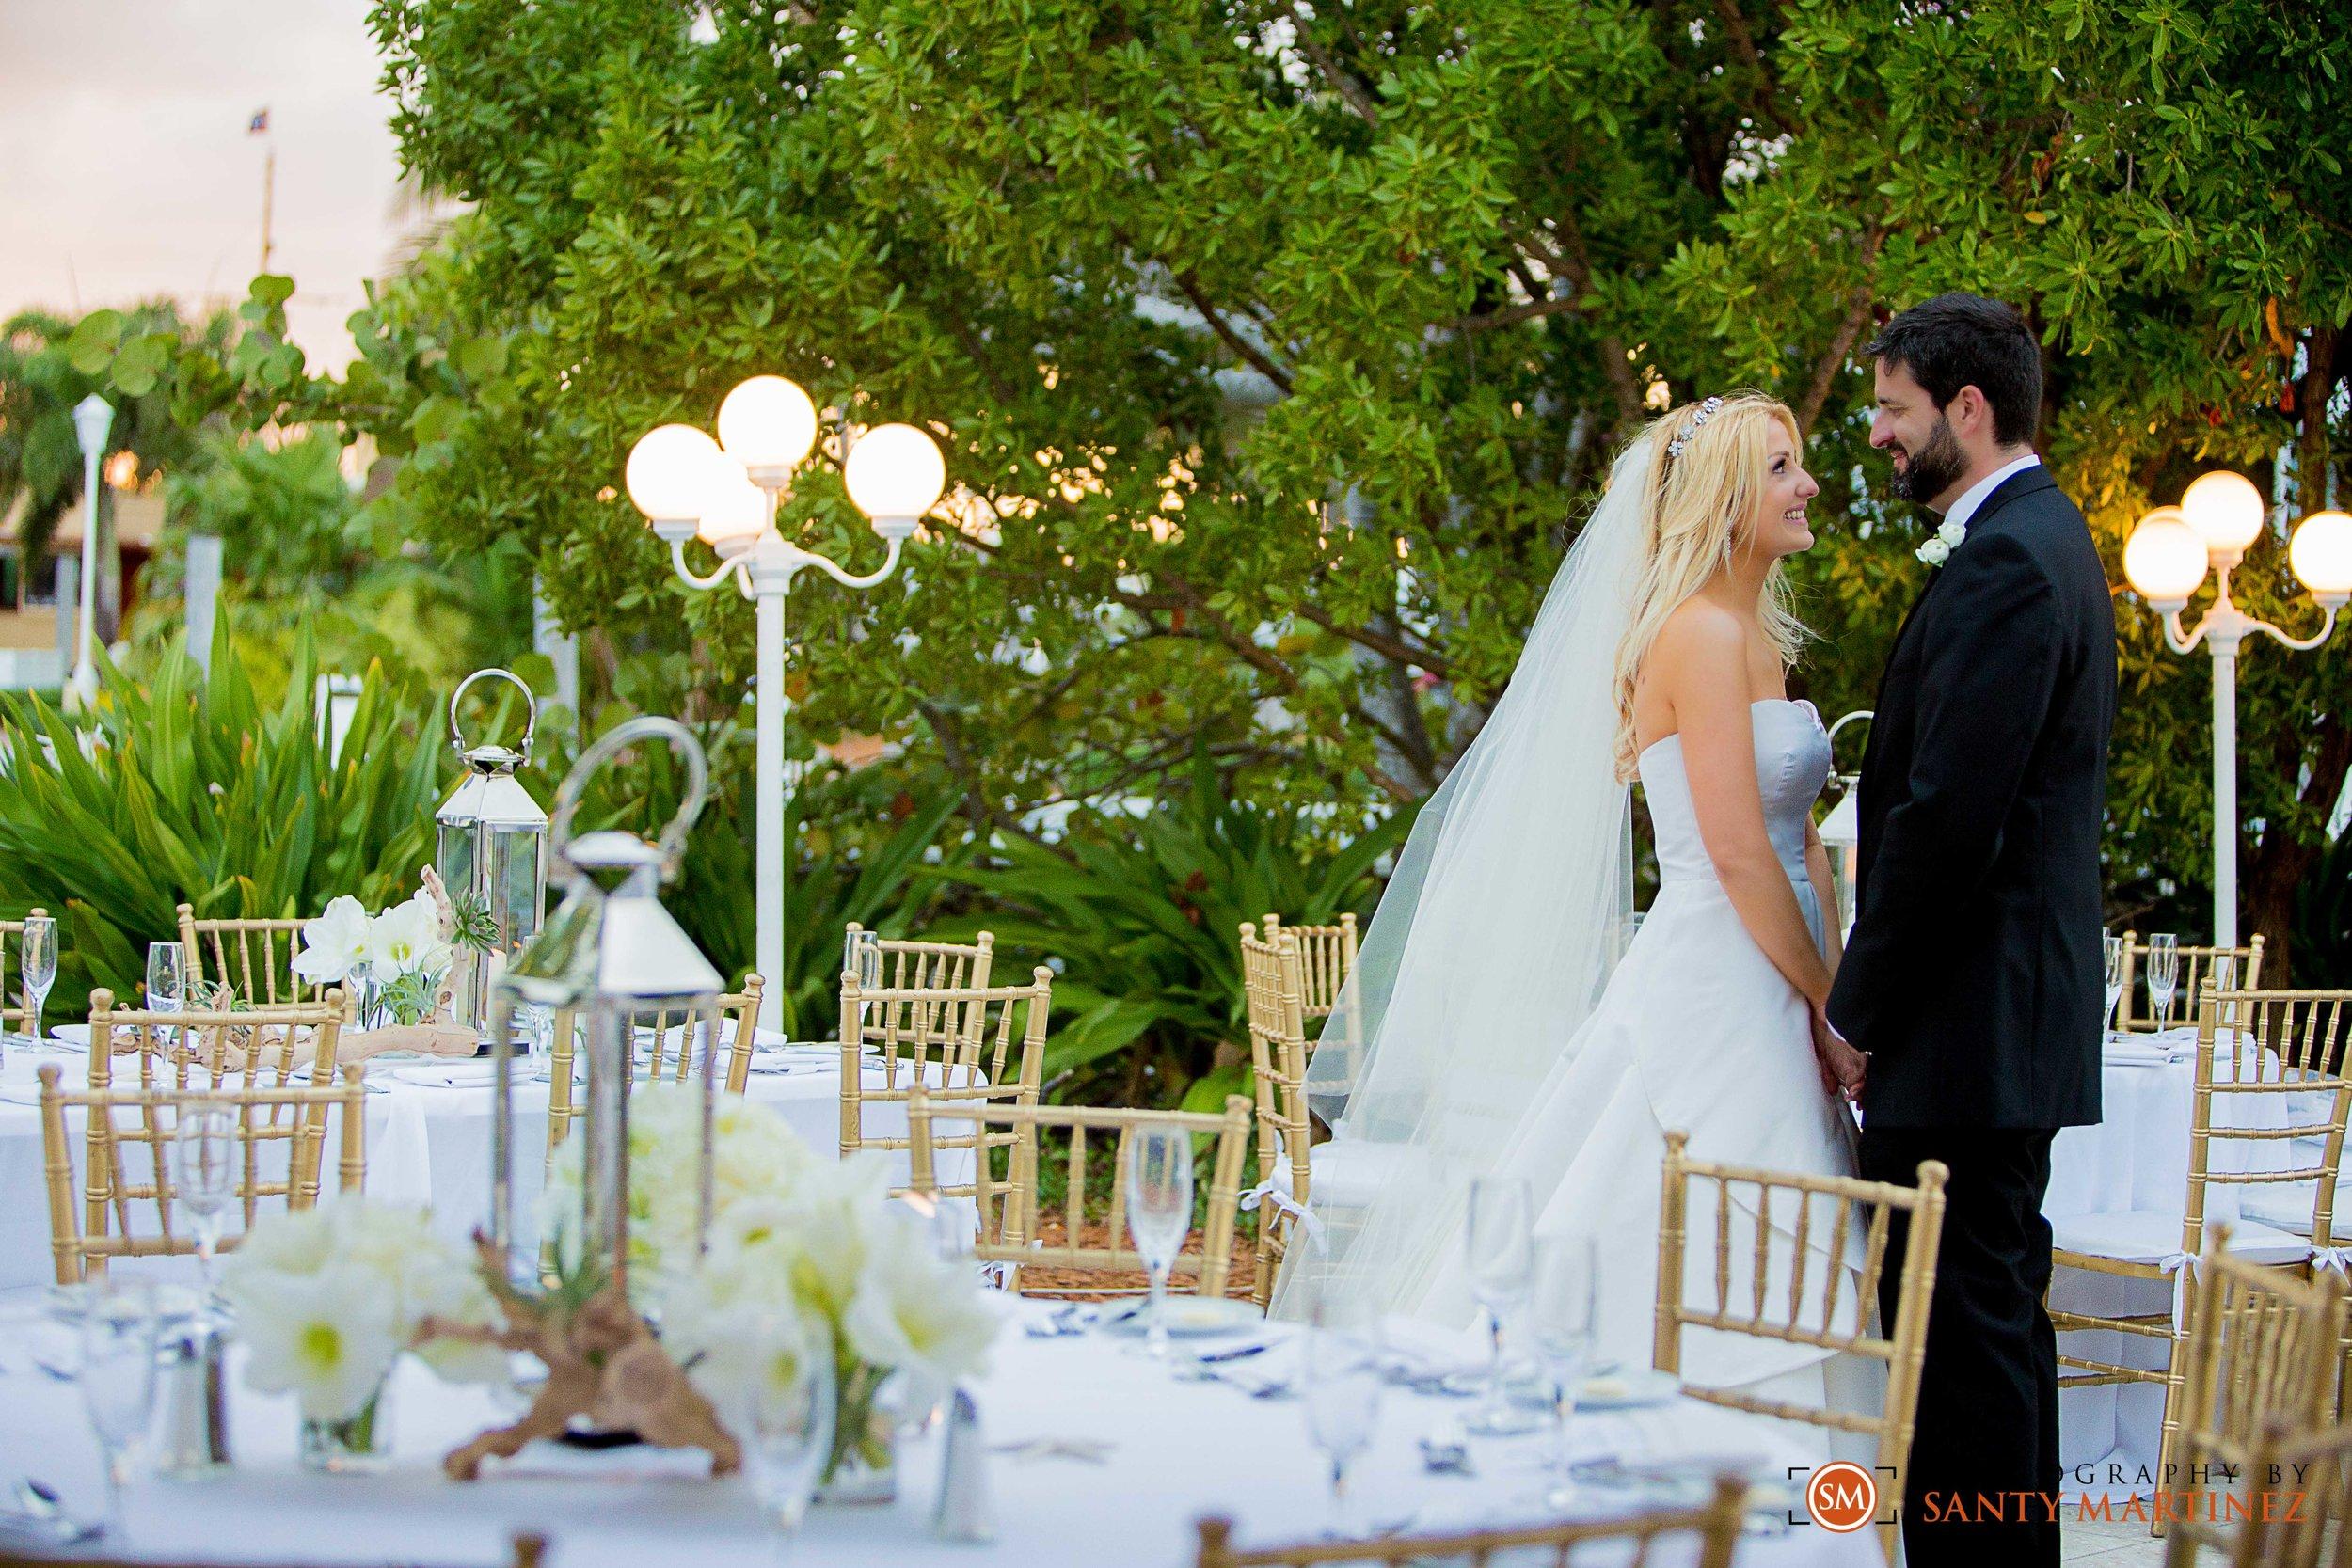 Miami Wedding Photographer - Santy Martinez -17.jpg